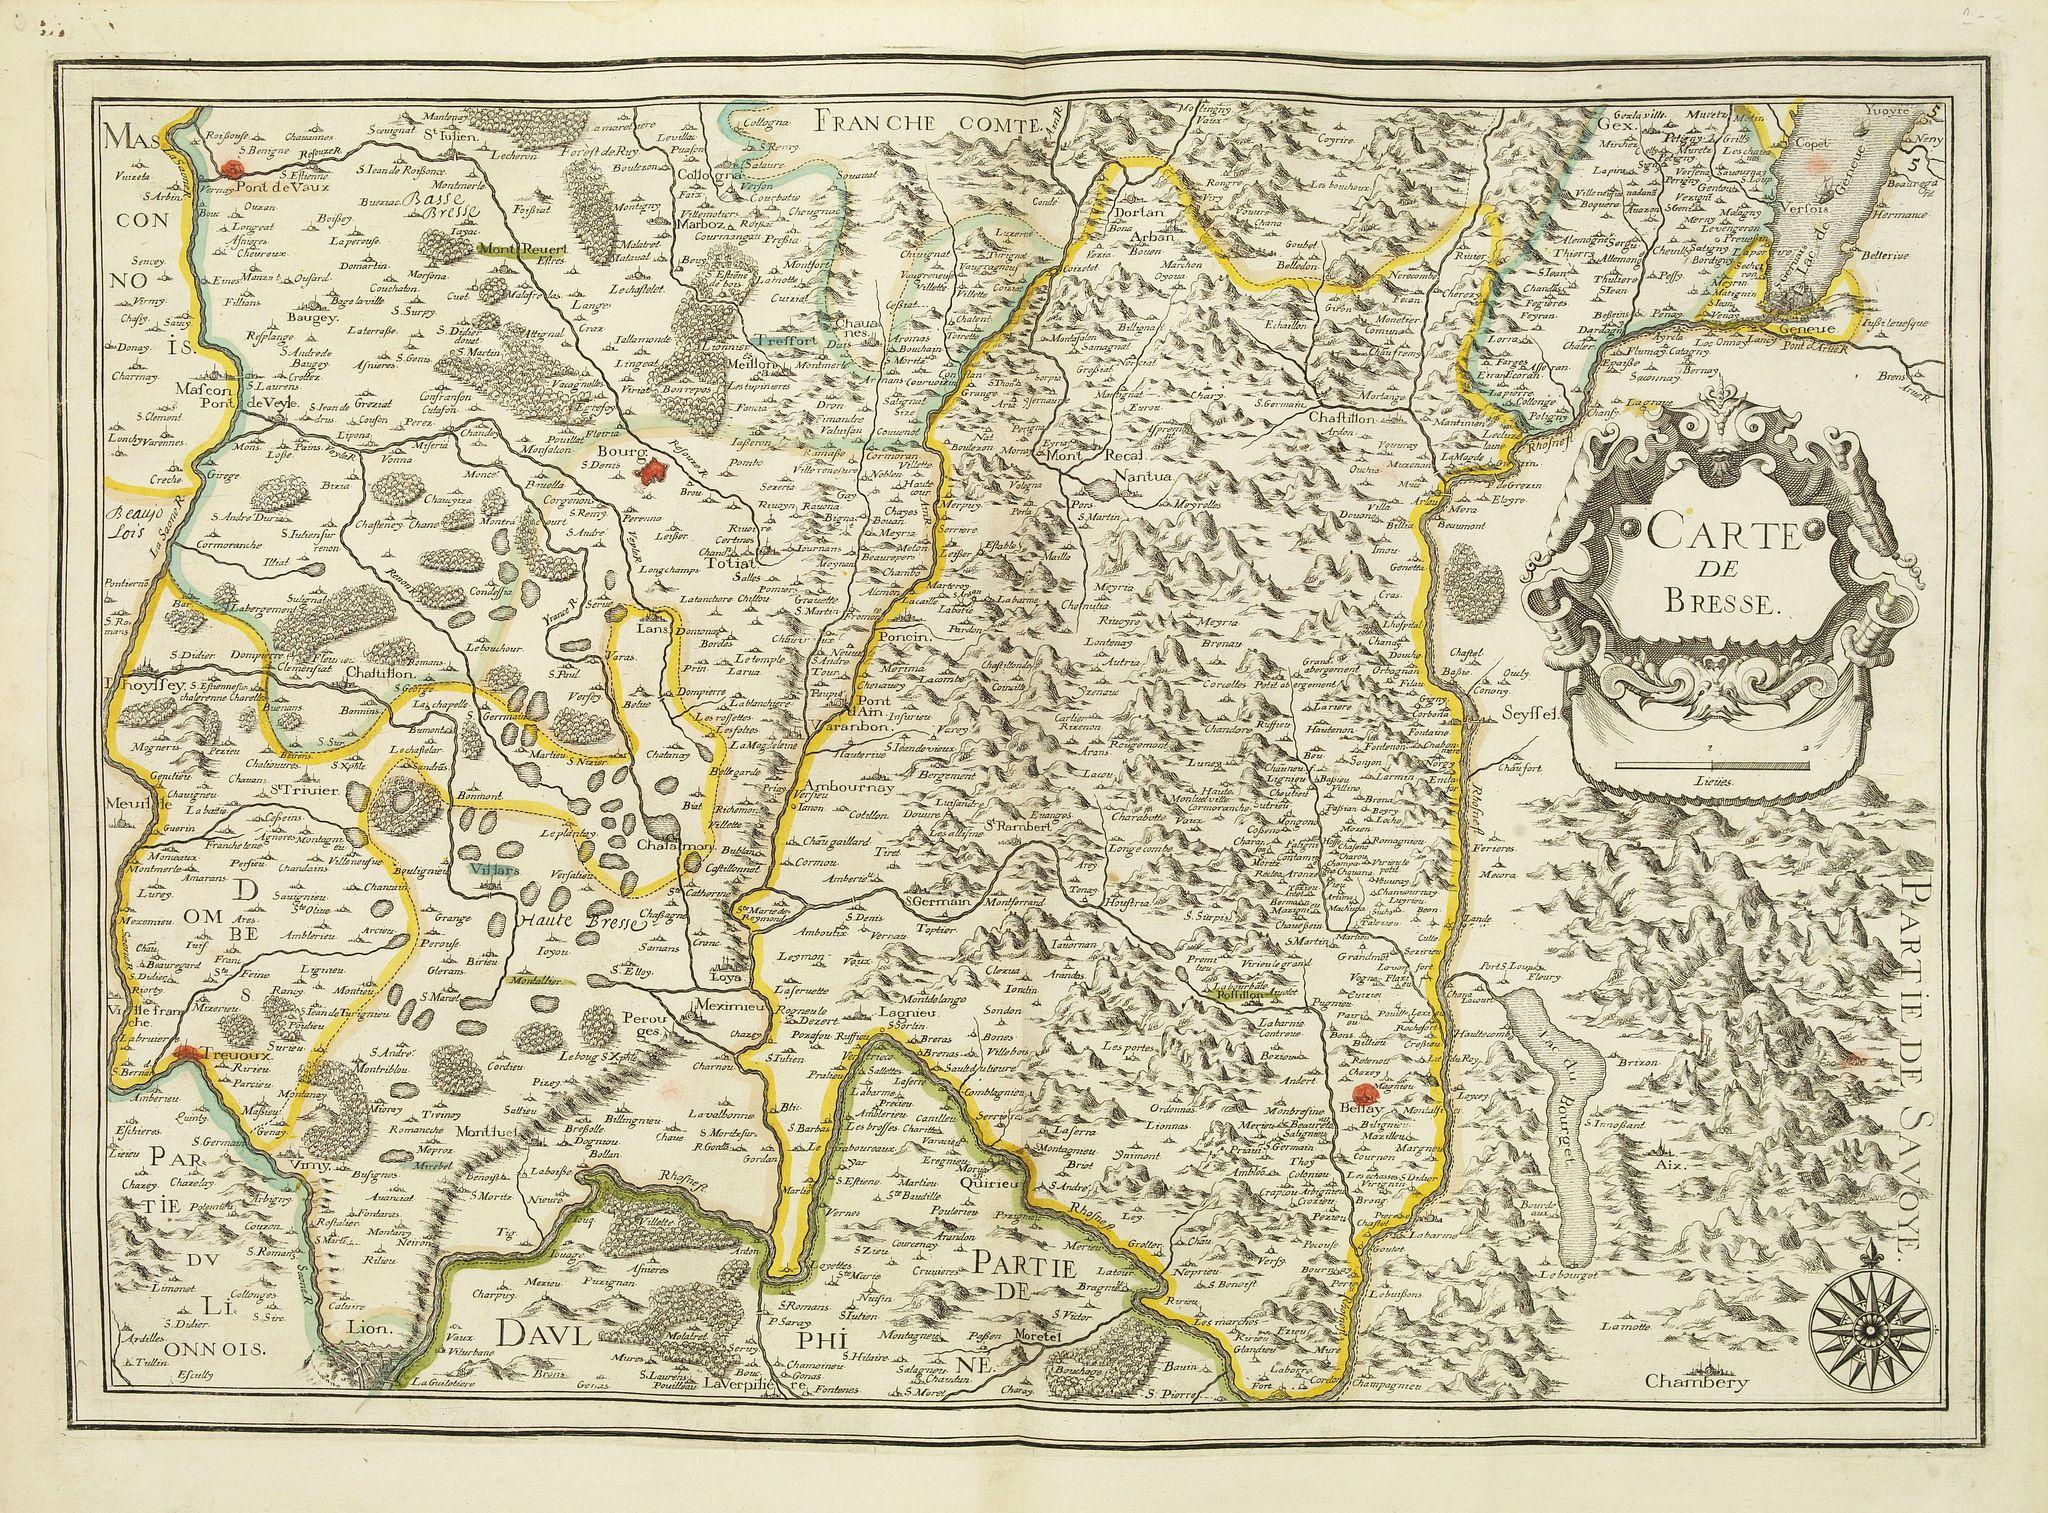 TASSIN, N. -  Carte de Bresse.